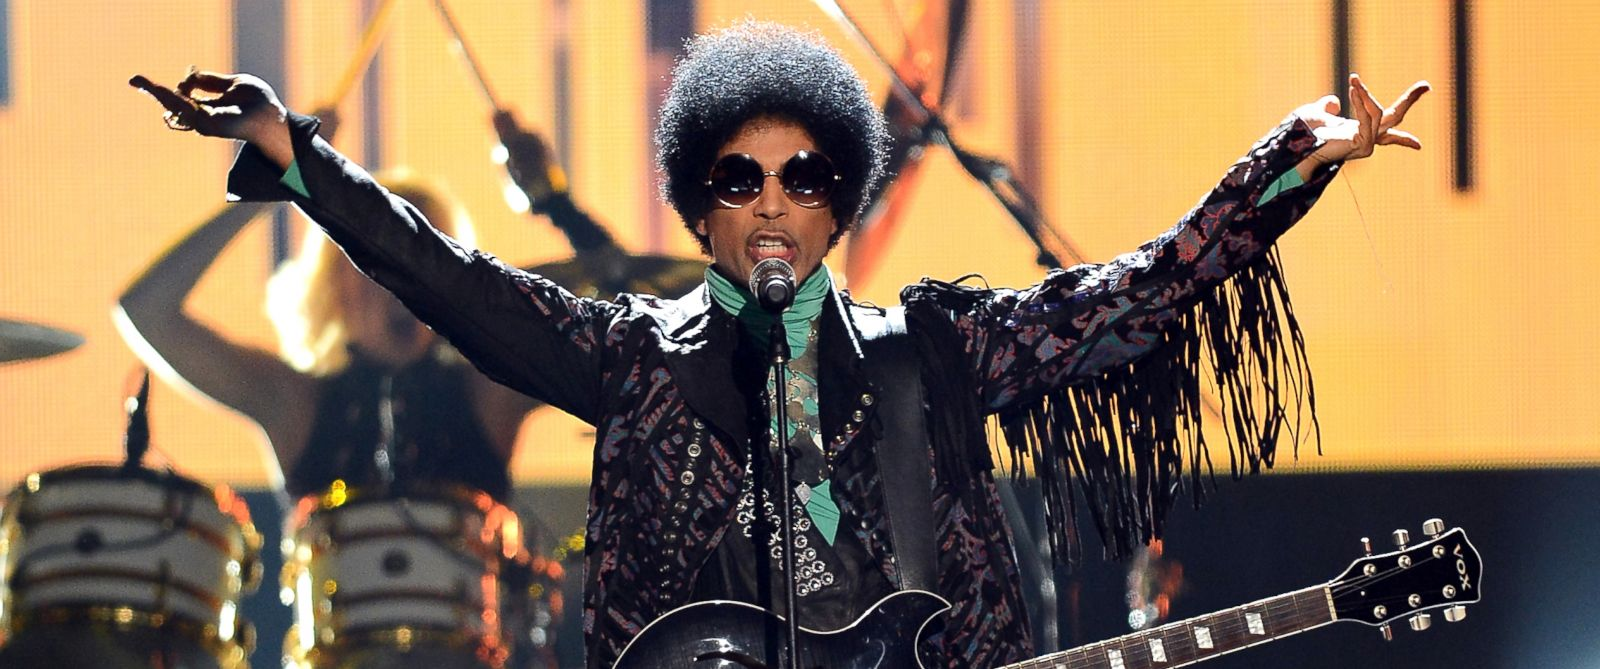 prince gone